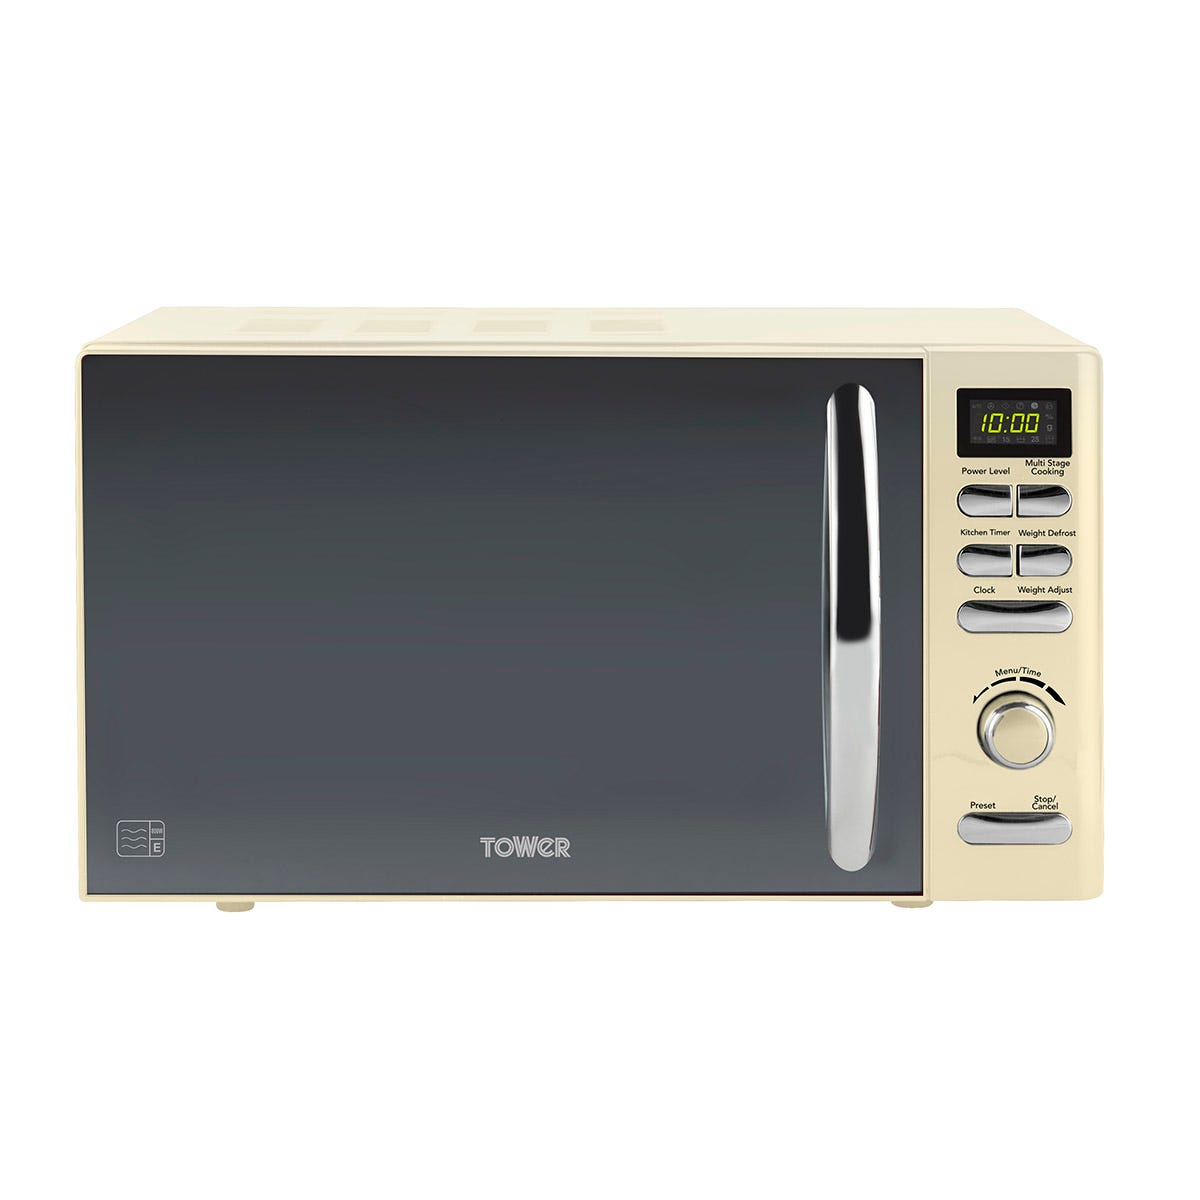 Tower T24019C Infinity 800W 20L Digital Microwave - Cream